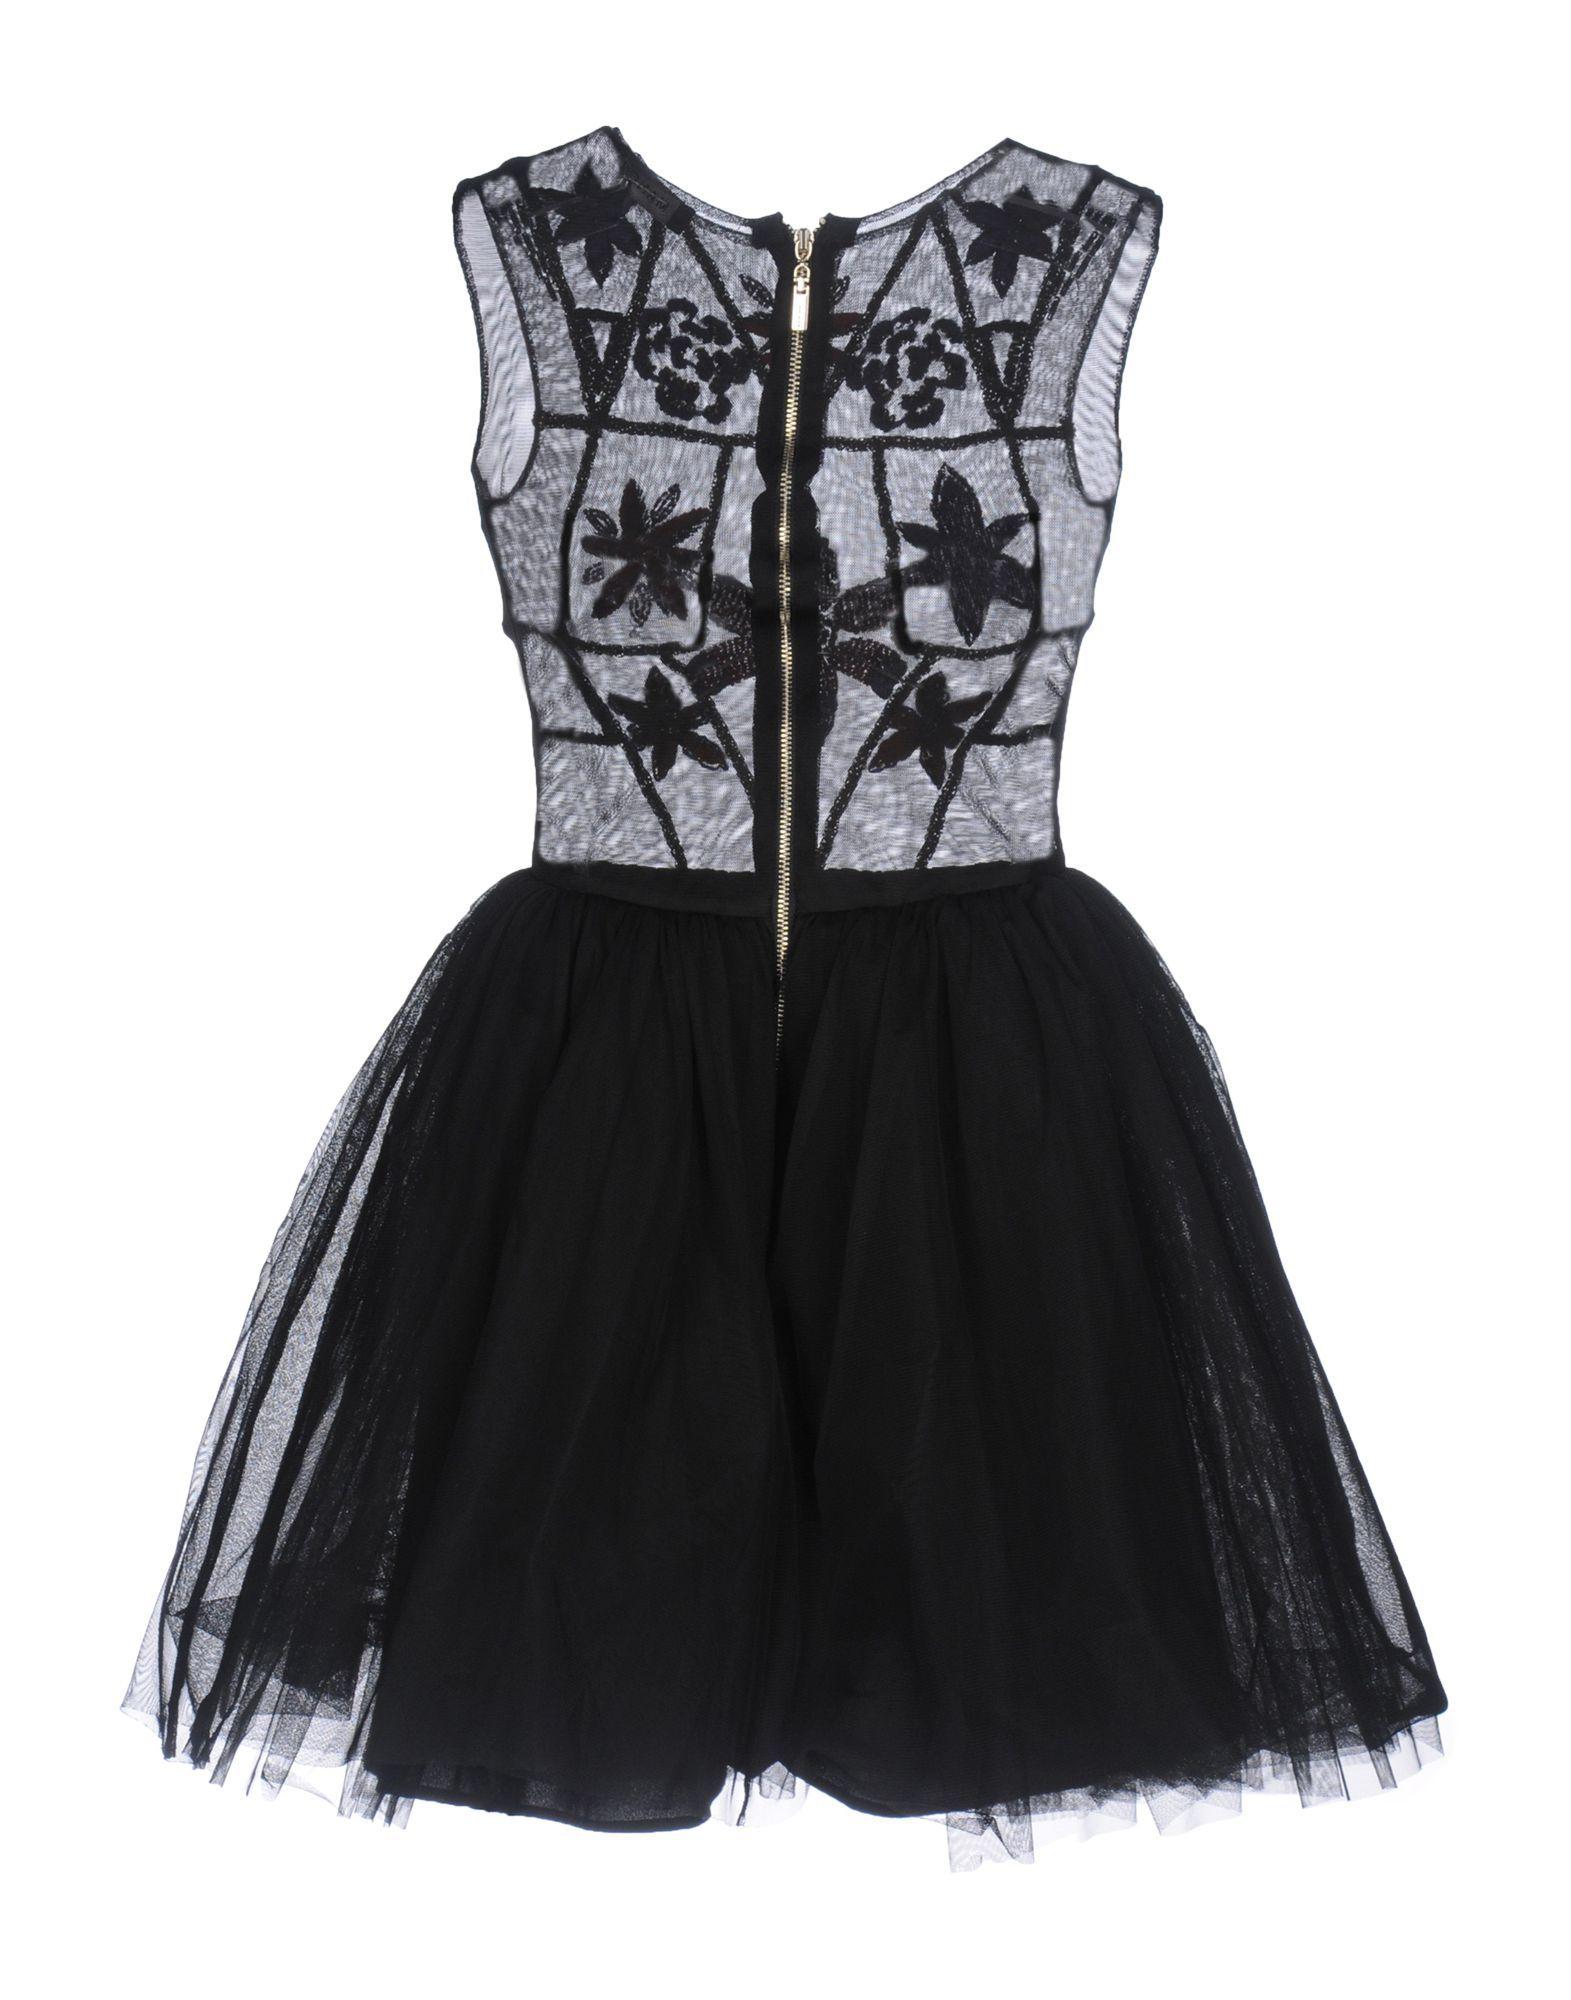 Mangano Black Tulle Short Dress